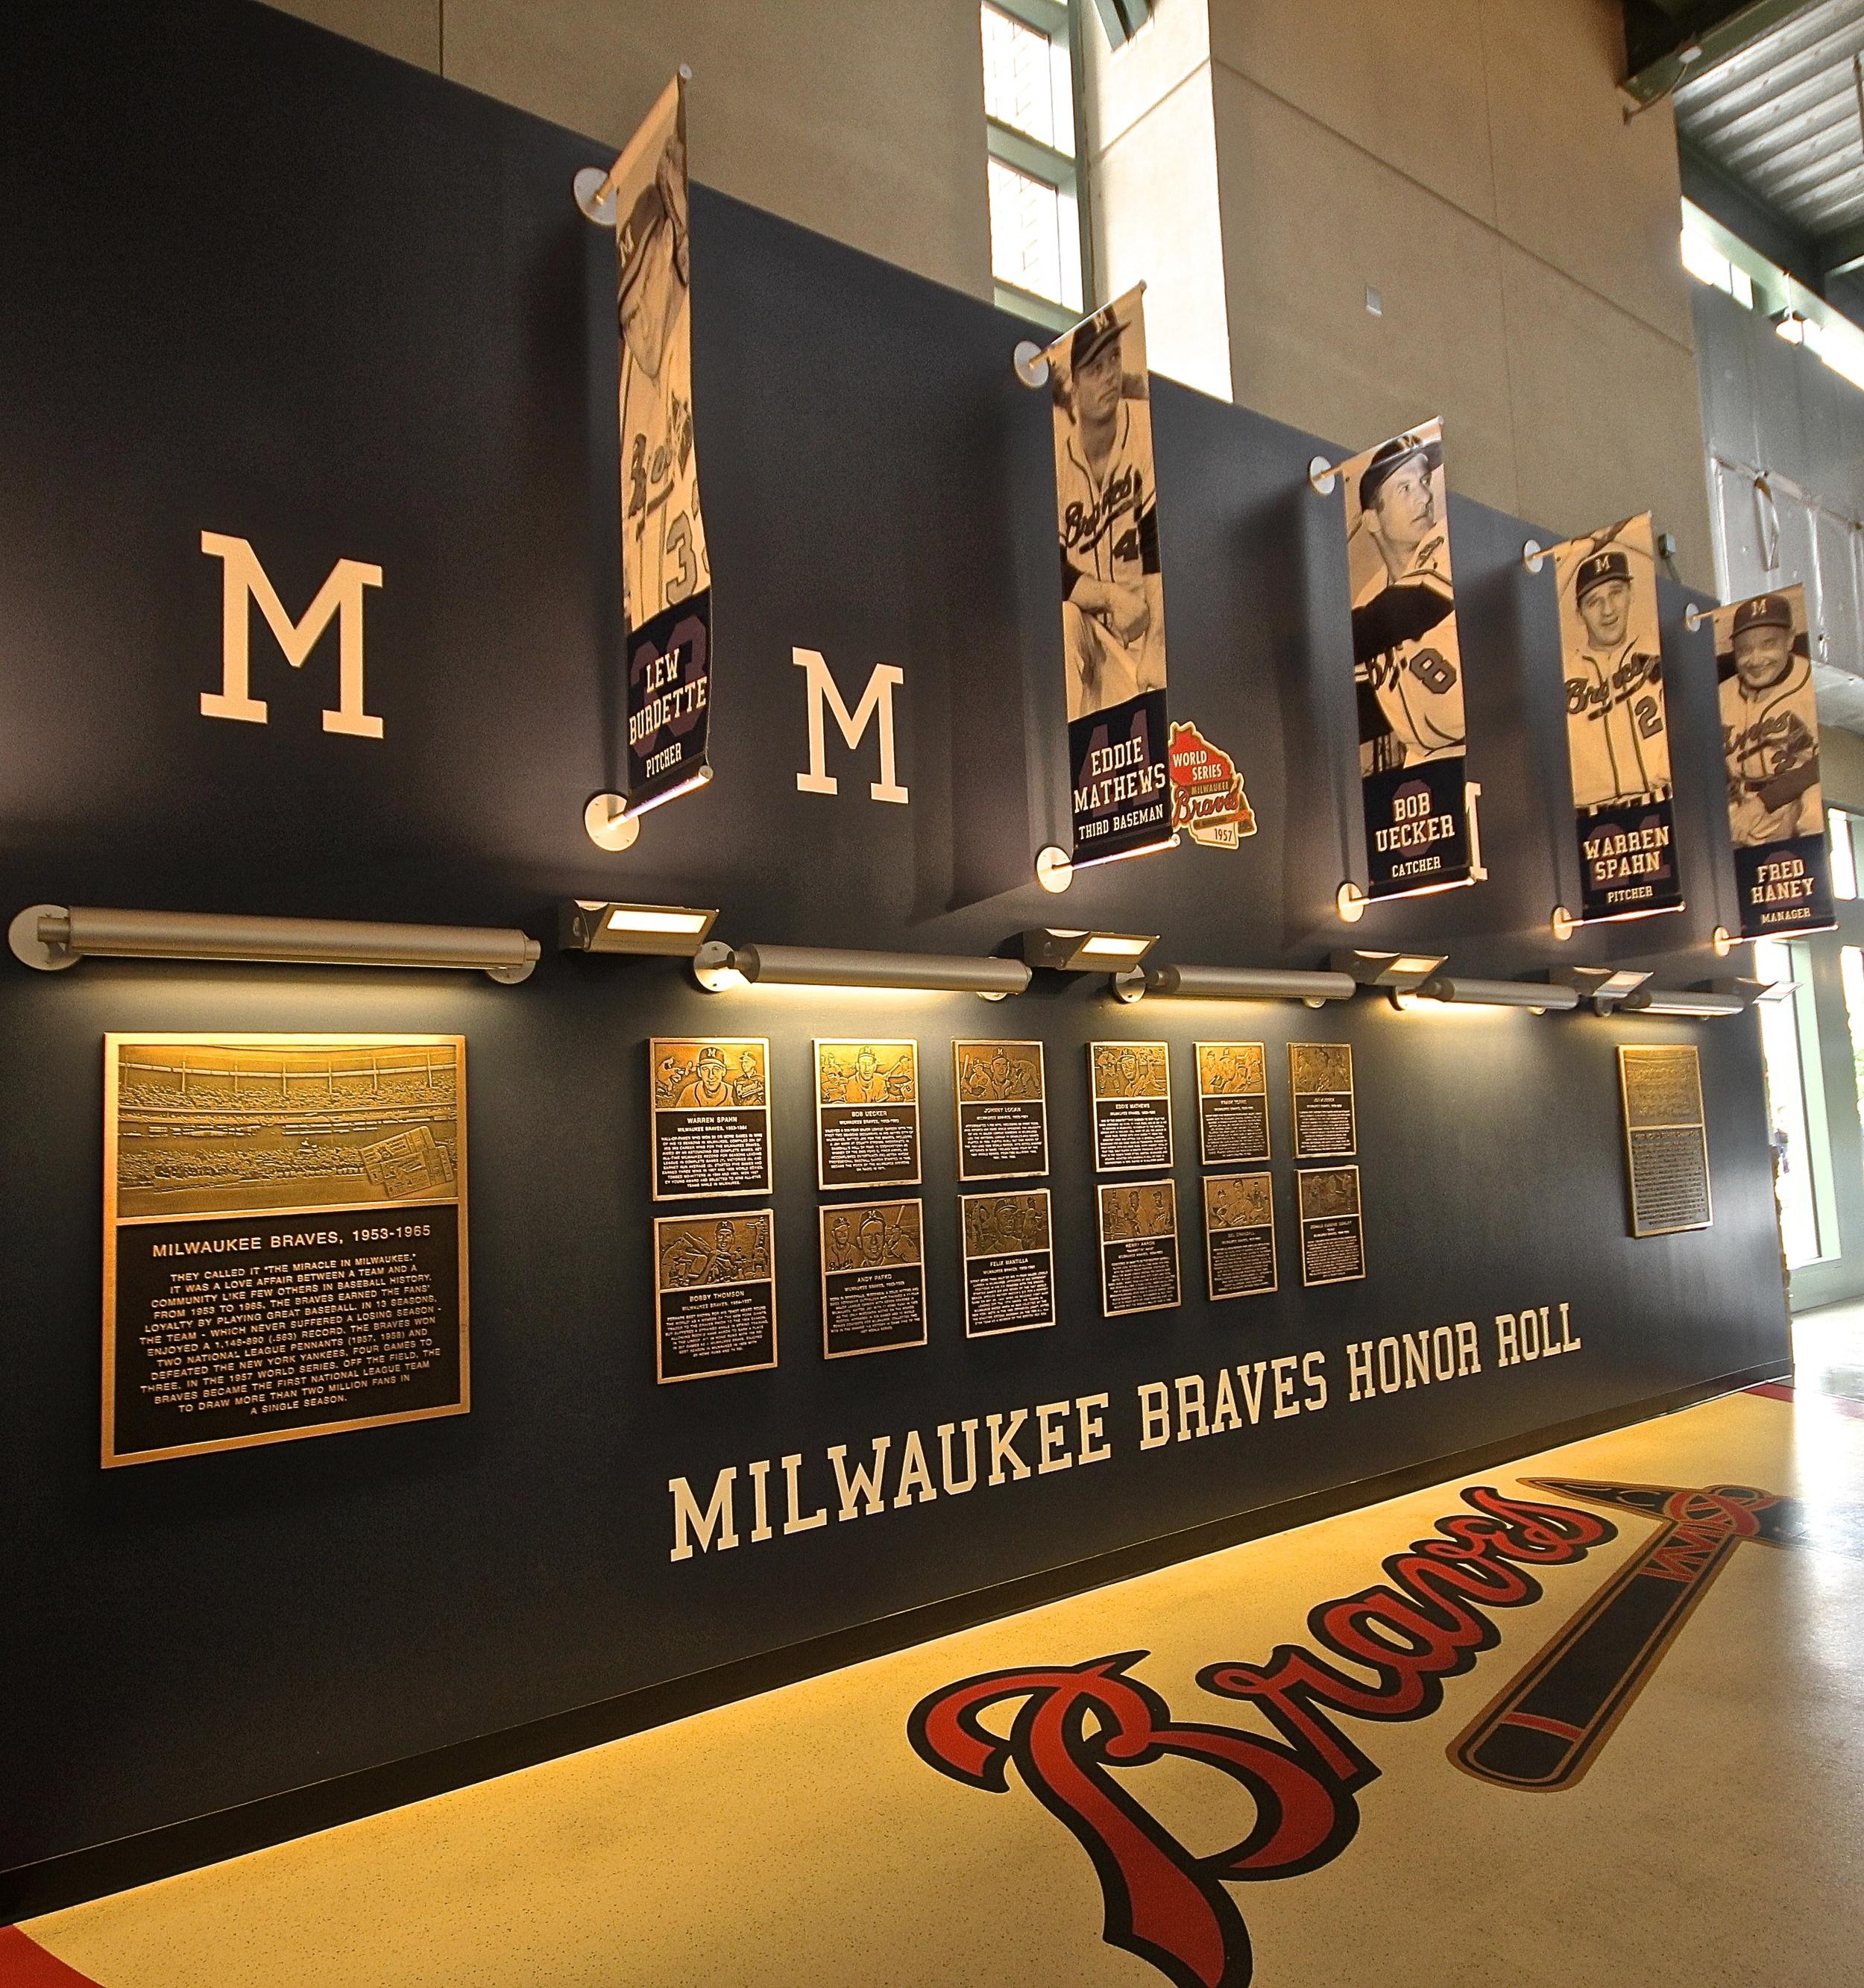 Milwaukee Braves tribute